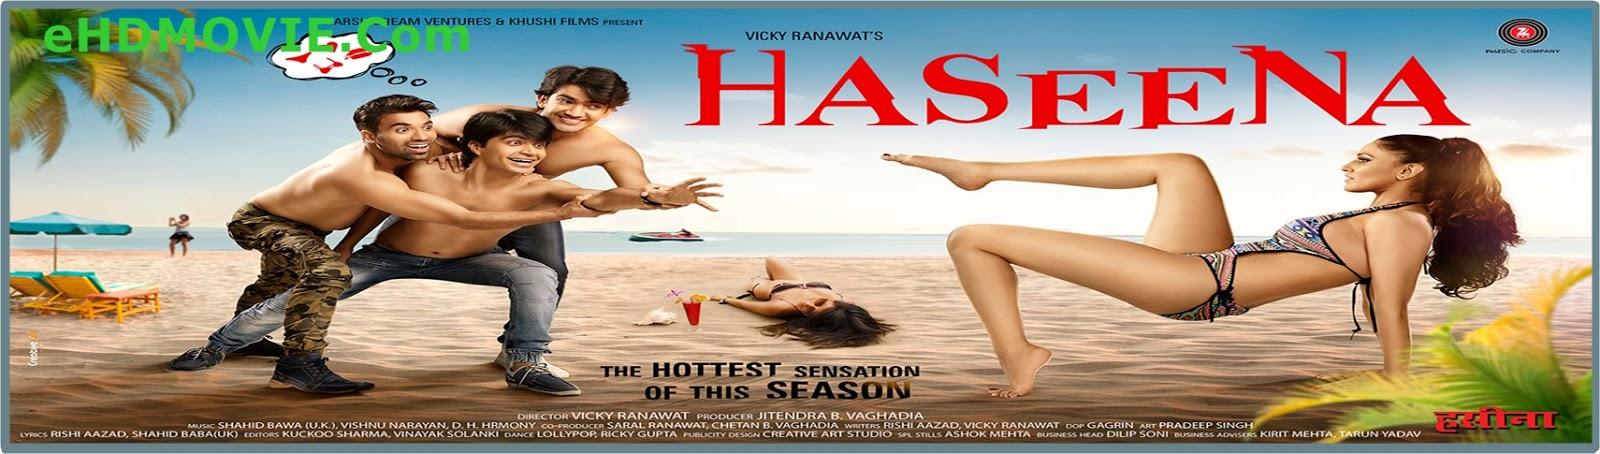 Haseena 2018 Full Movie Hindi 720p - 480p ORG HDRip 400MB - 1.3 ESubs Free Download